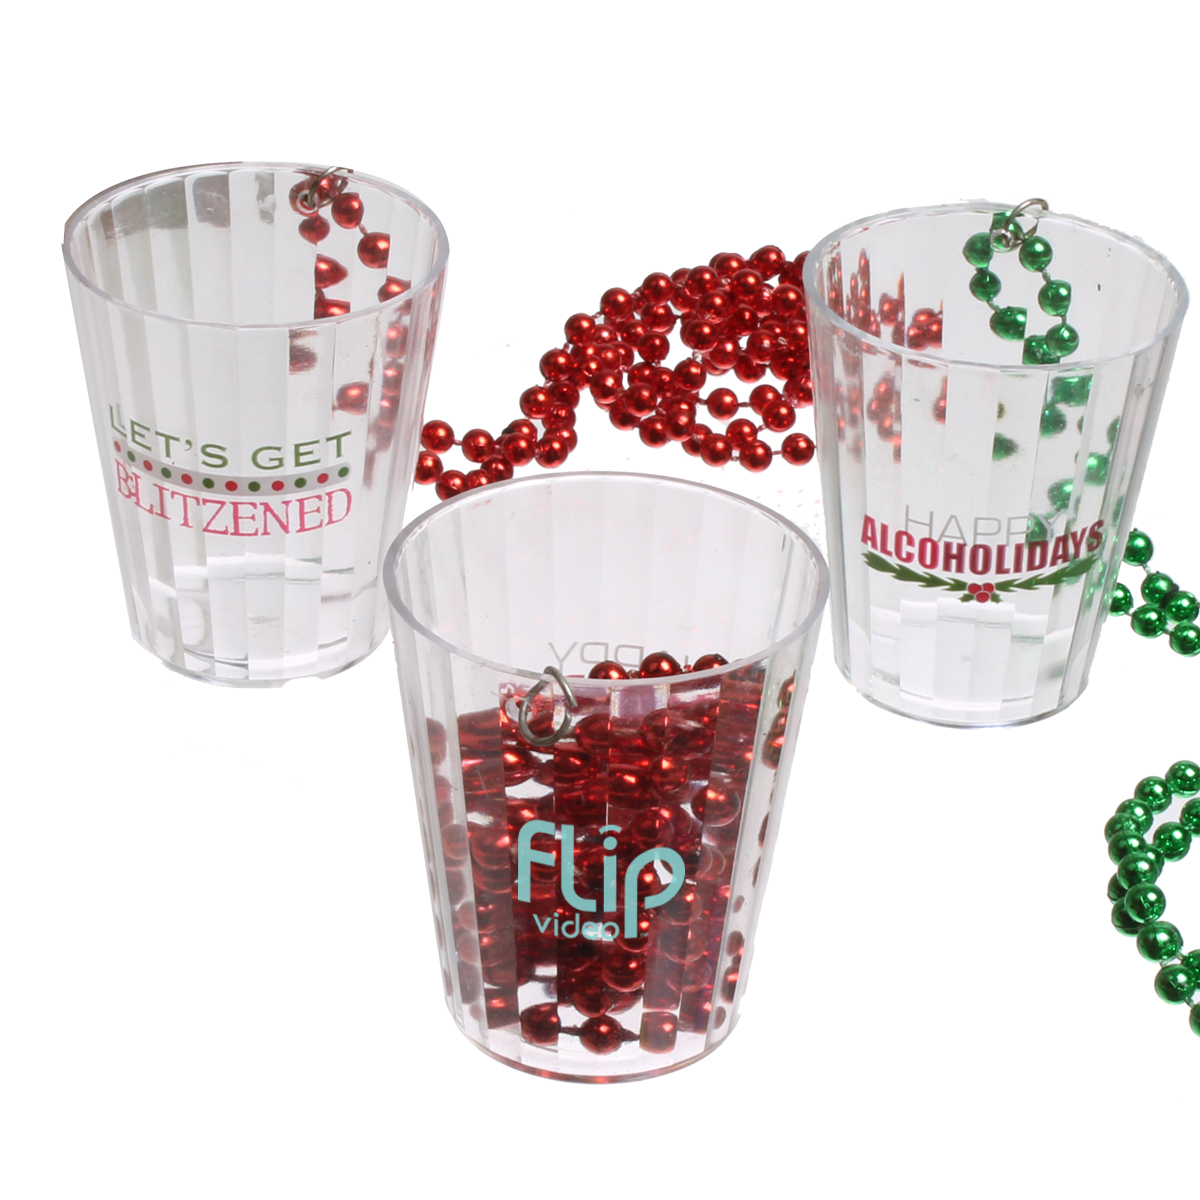 2 Oz. Xmas Shot Glasses